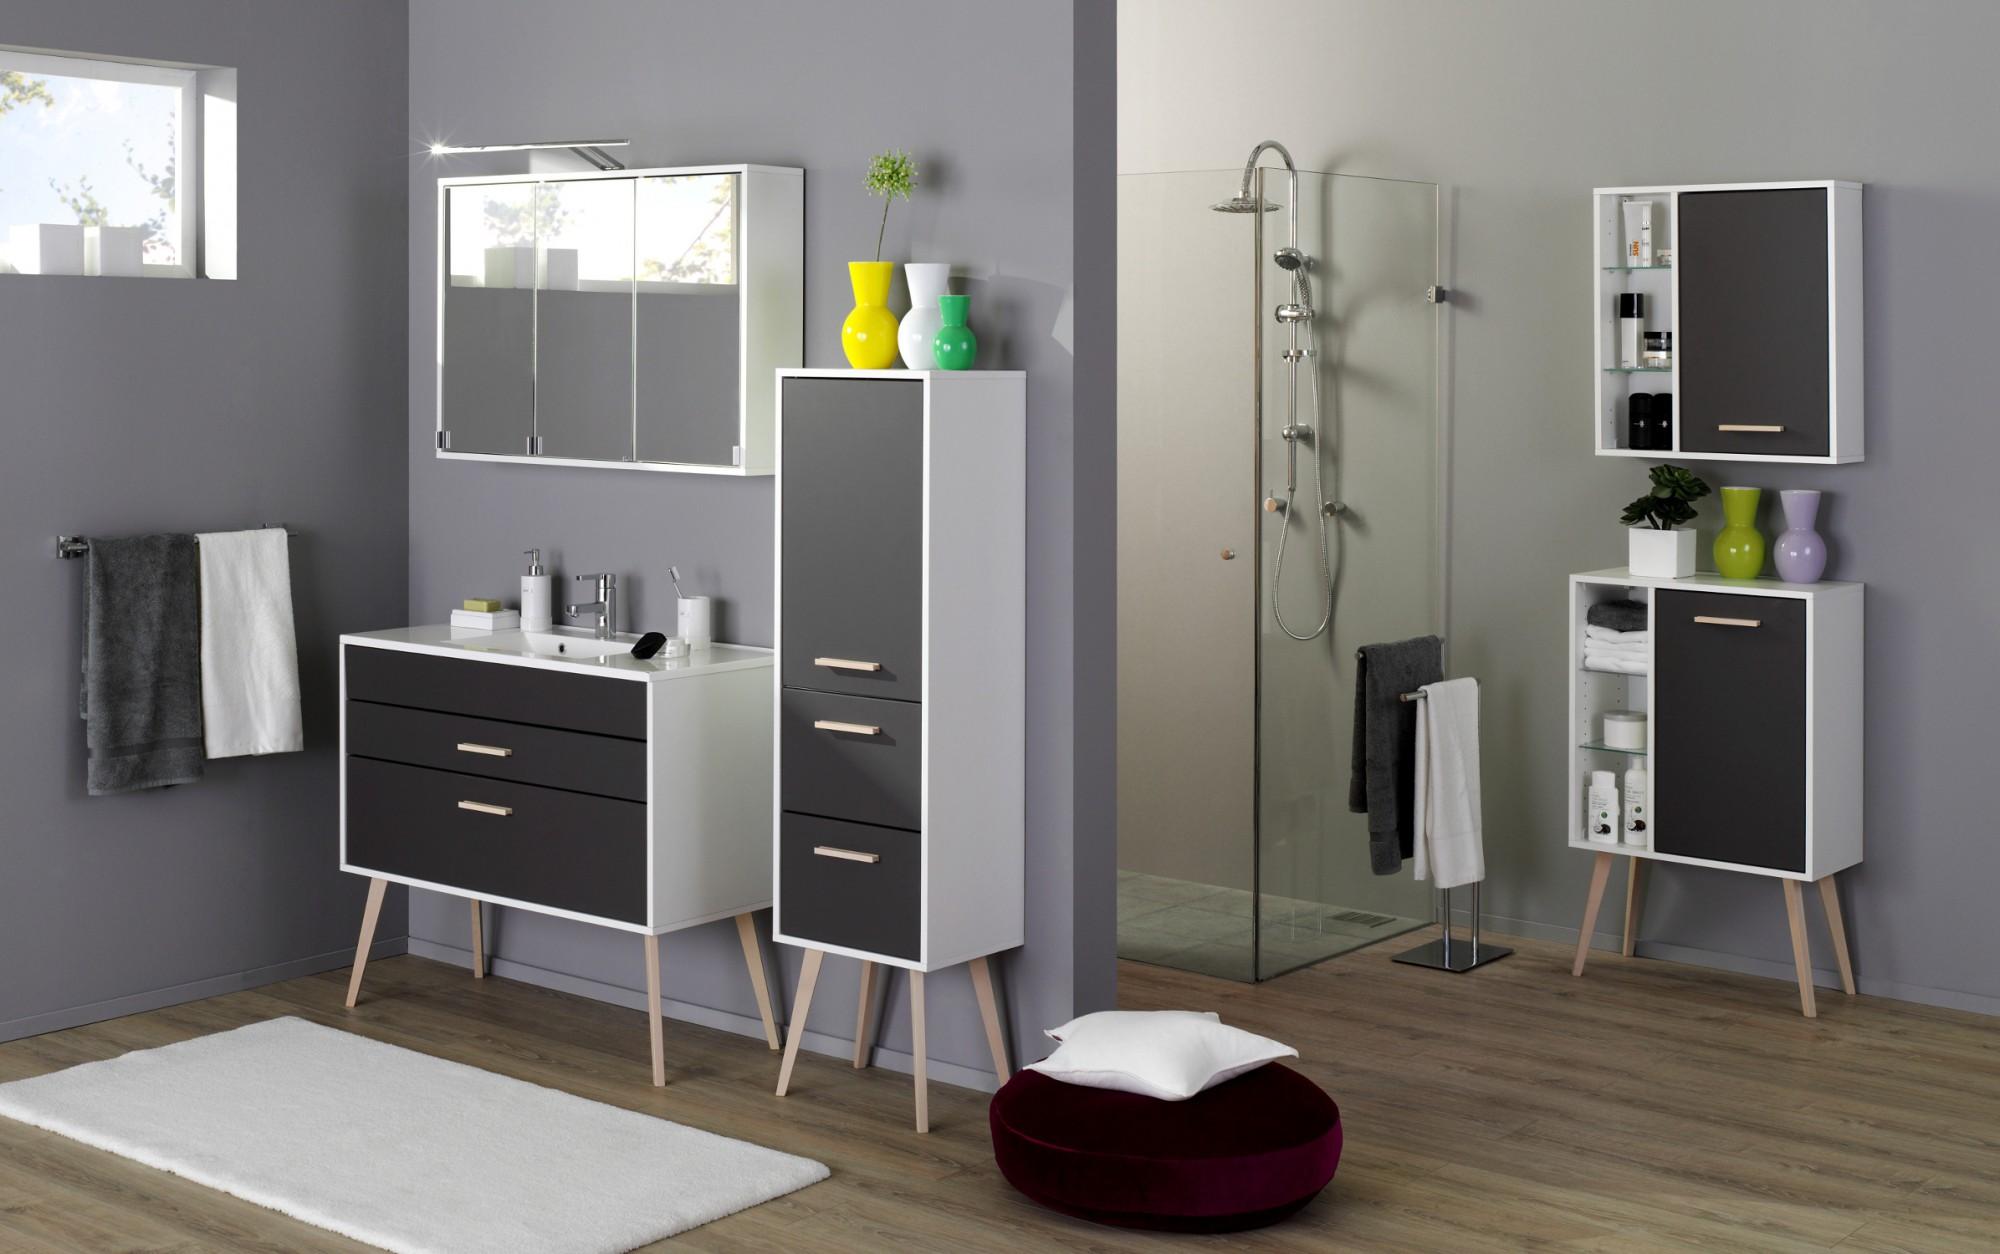 Badezimmer h ngeschrank malm badezimmerschrank 60 cm for Anthrazit badezimmer